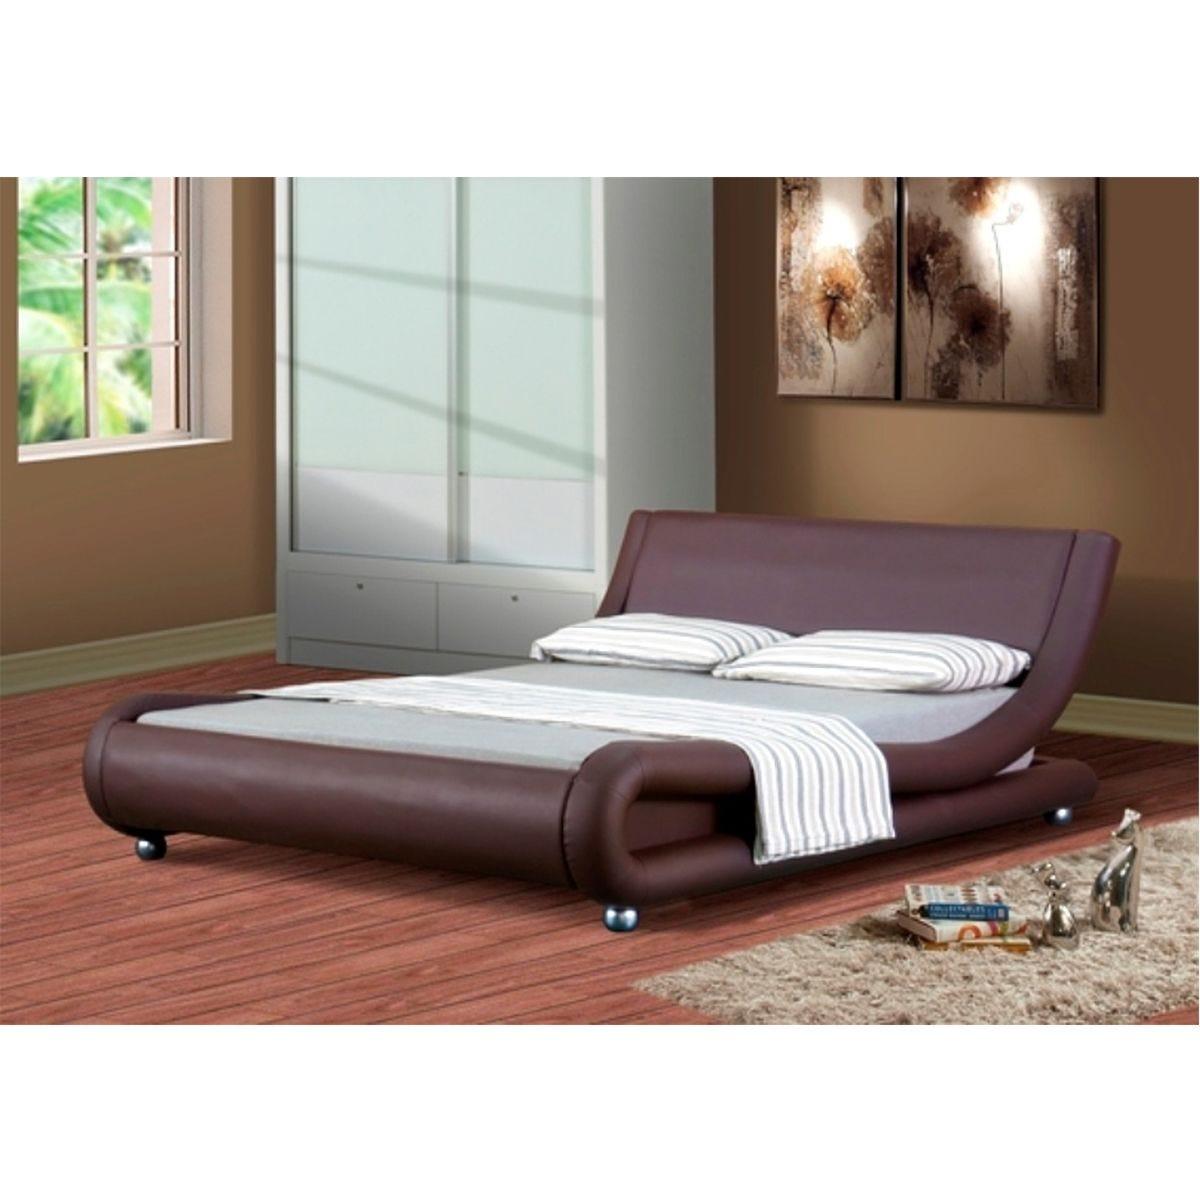 Jaxon Bed Frame - Chocolate